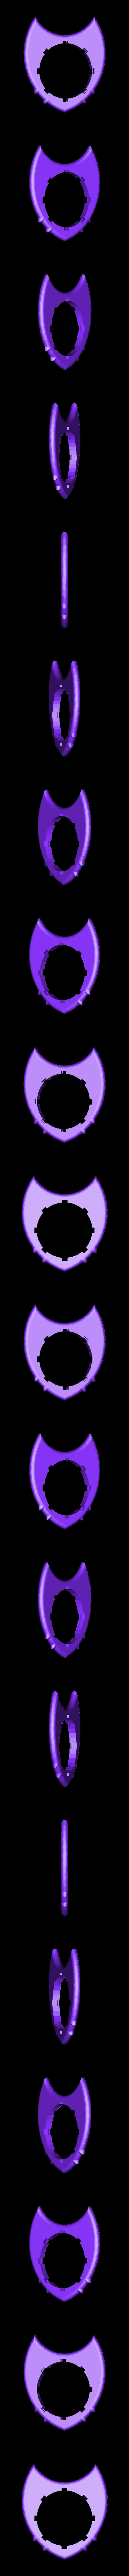 26 DUA-Dent ElasticCentreOctogonal 2'30 04.stl Download free STL file DUA-Dent / Smooth ElasticCentreOctogonal/Pyramidal Curve 2'30mm • 3D printing template, carleslluisar